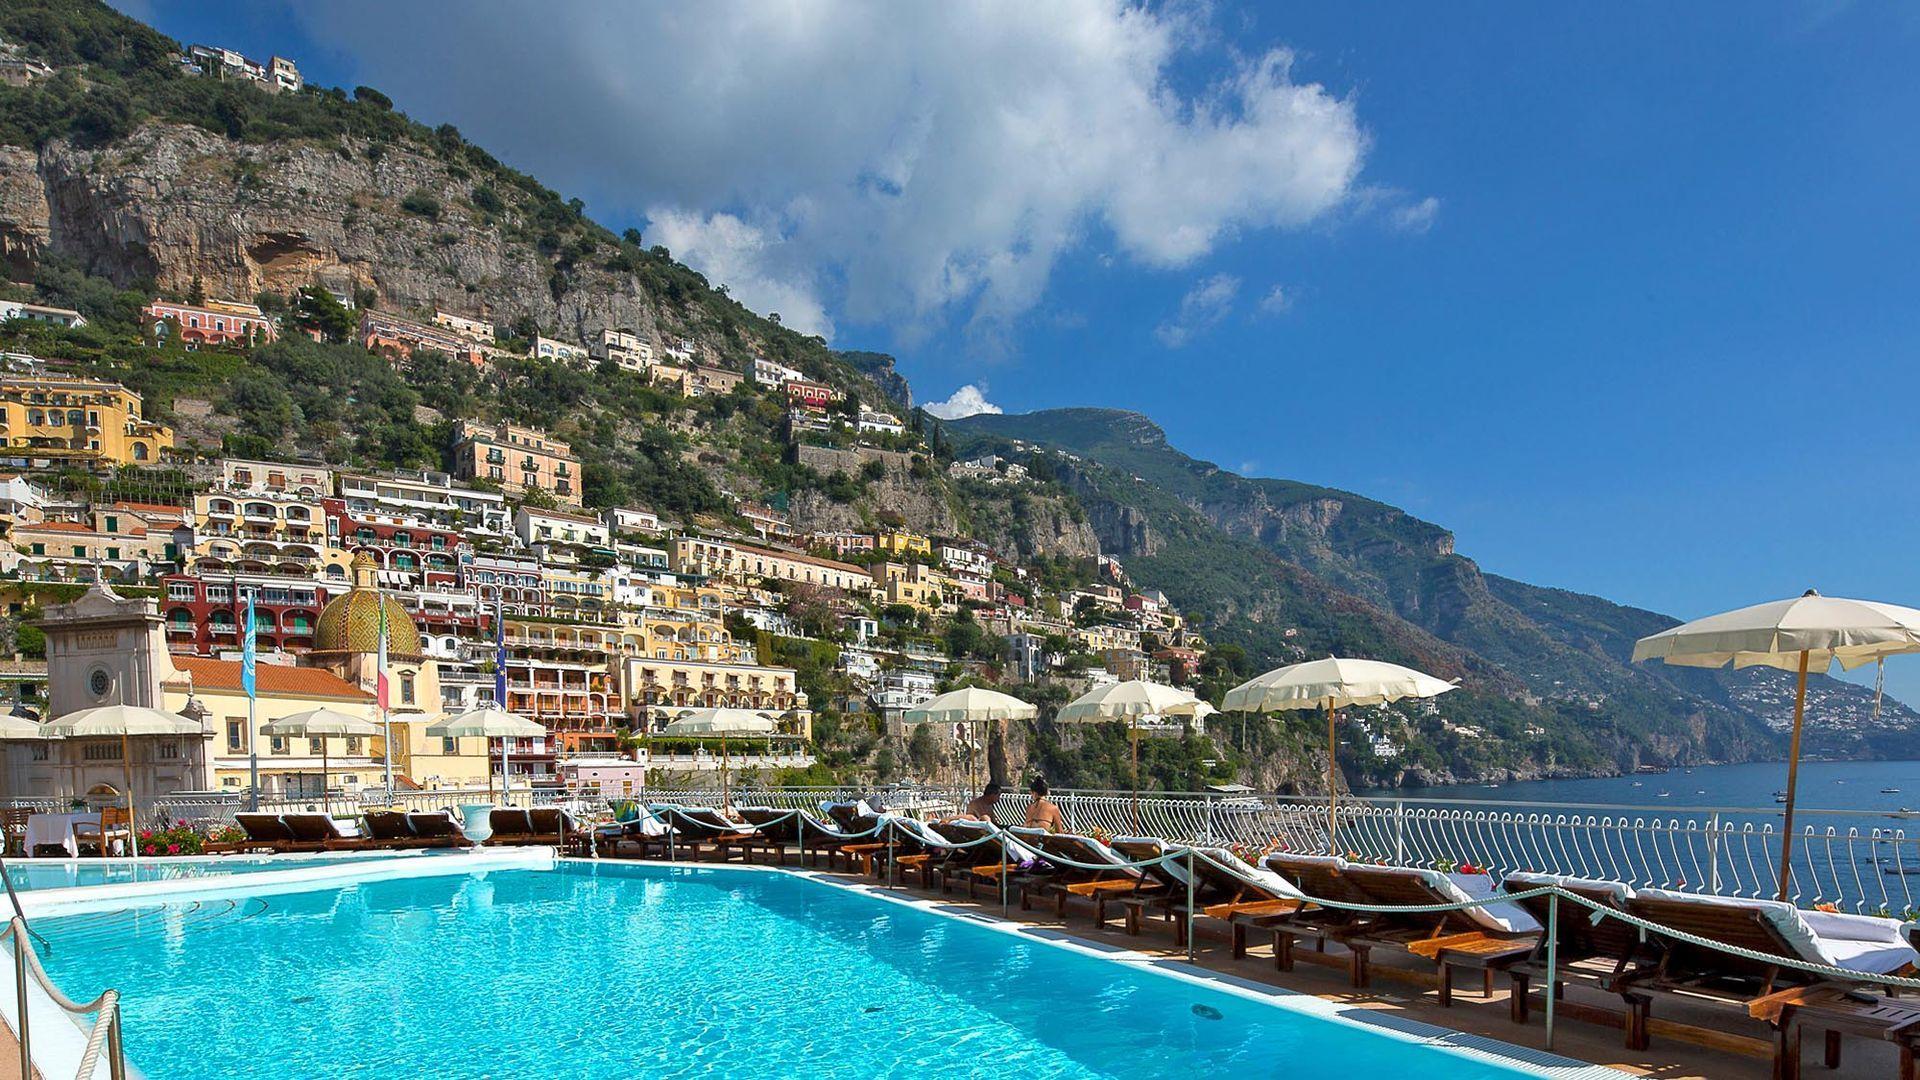 Positano Hotels 5 Star Best Luxury Hotels In Positano On The